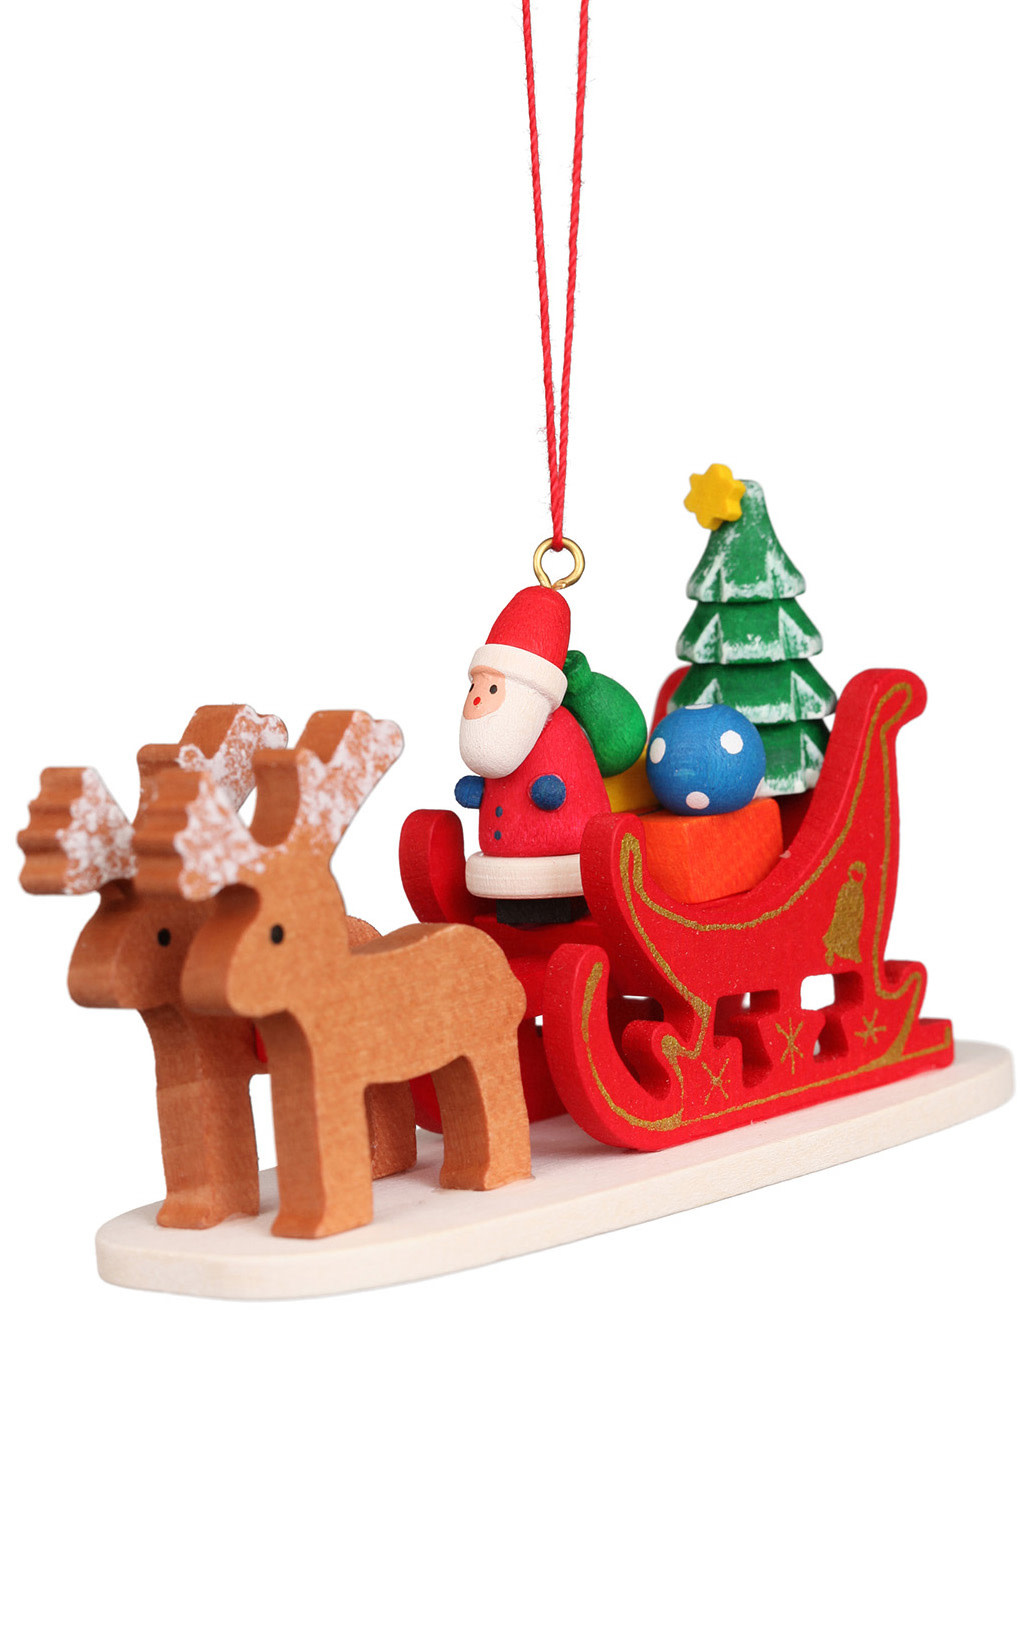 10-0636 Ulbricht Ornament - Santa Claus Sled